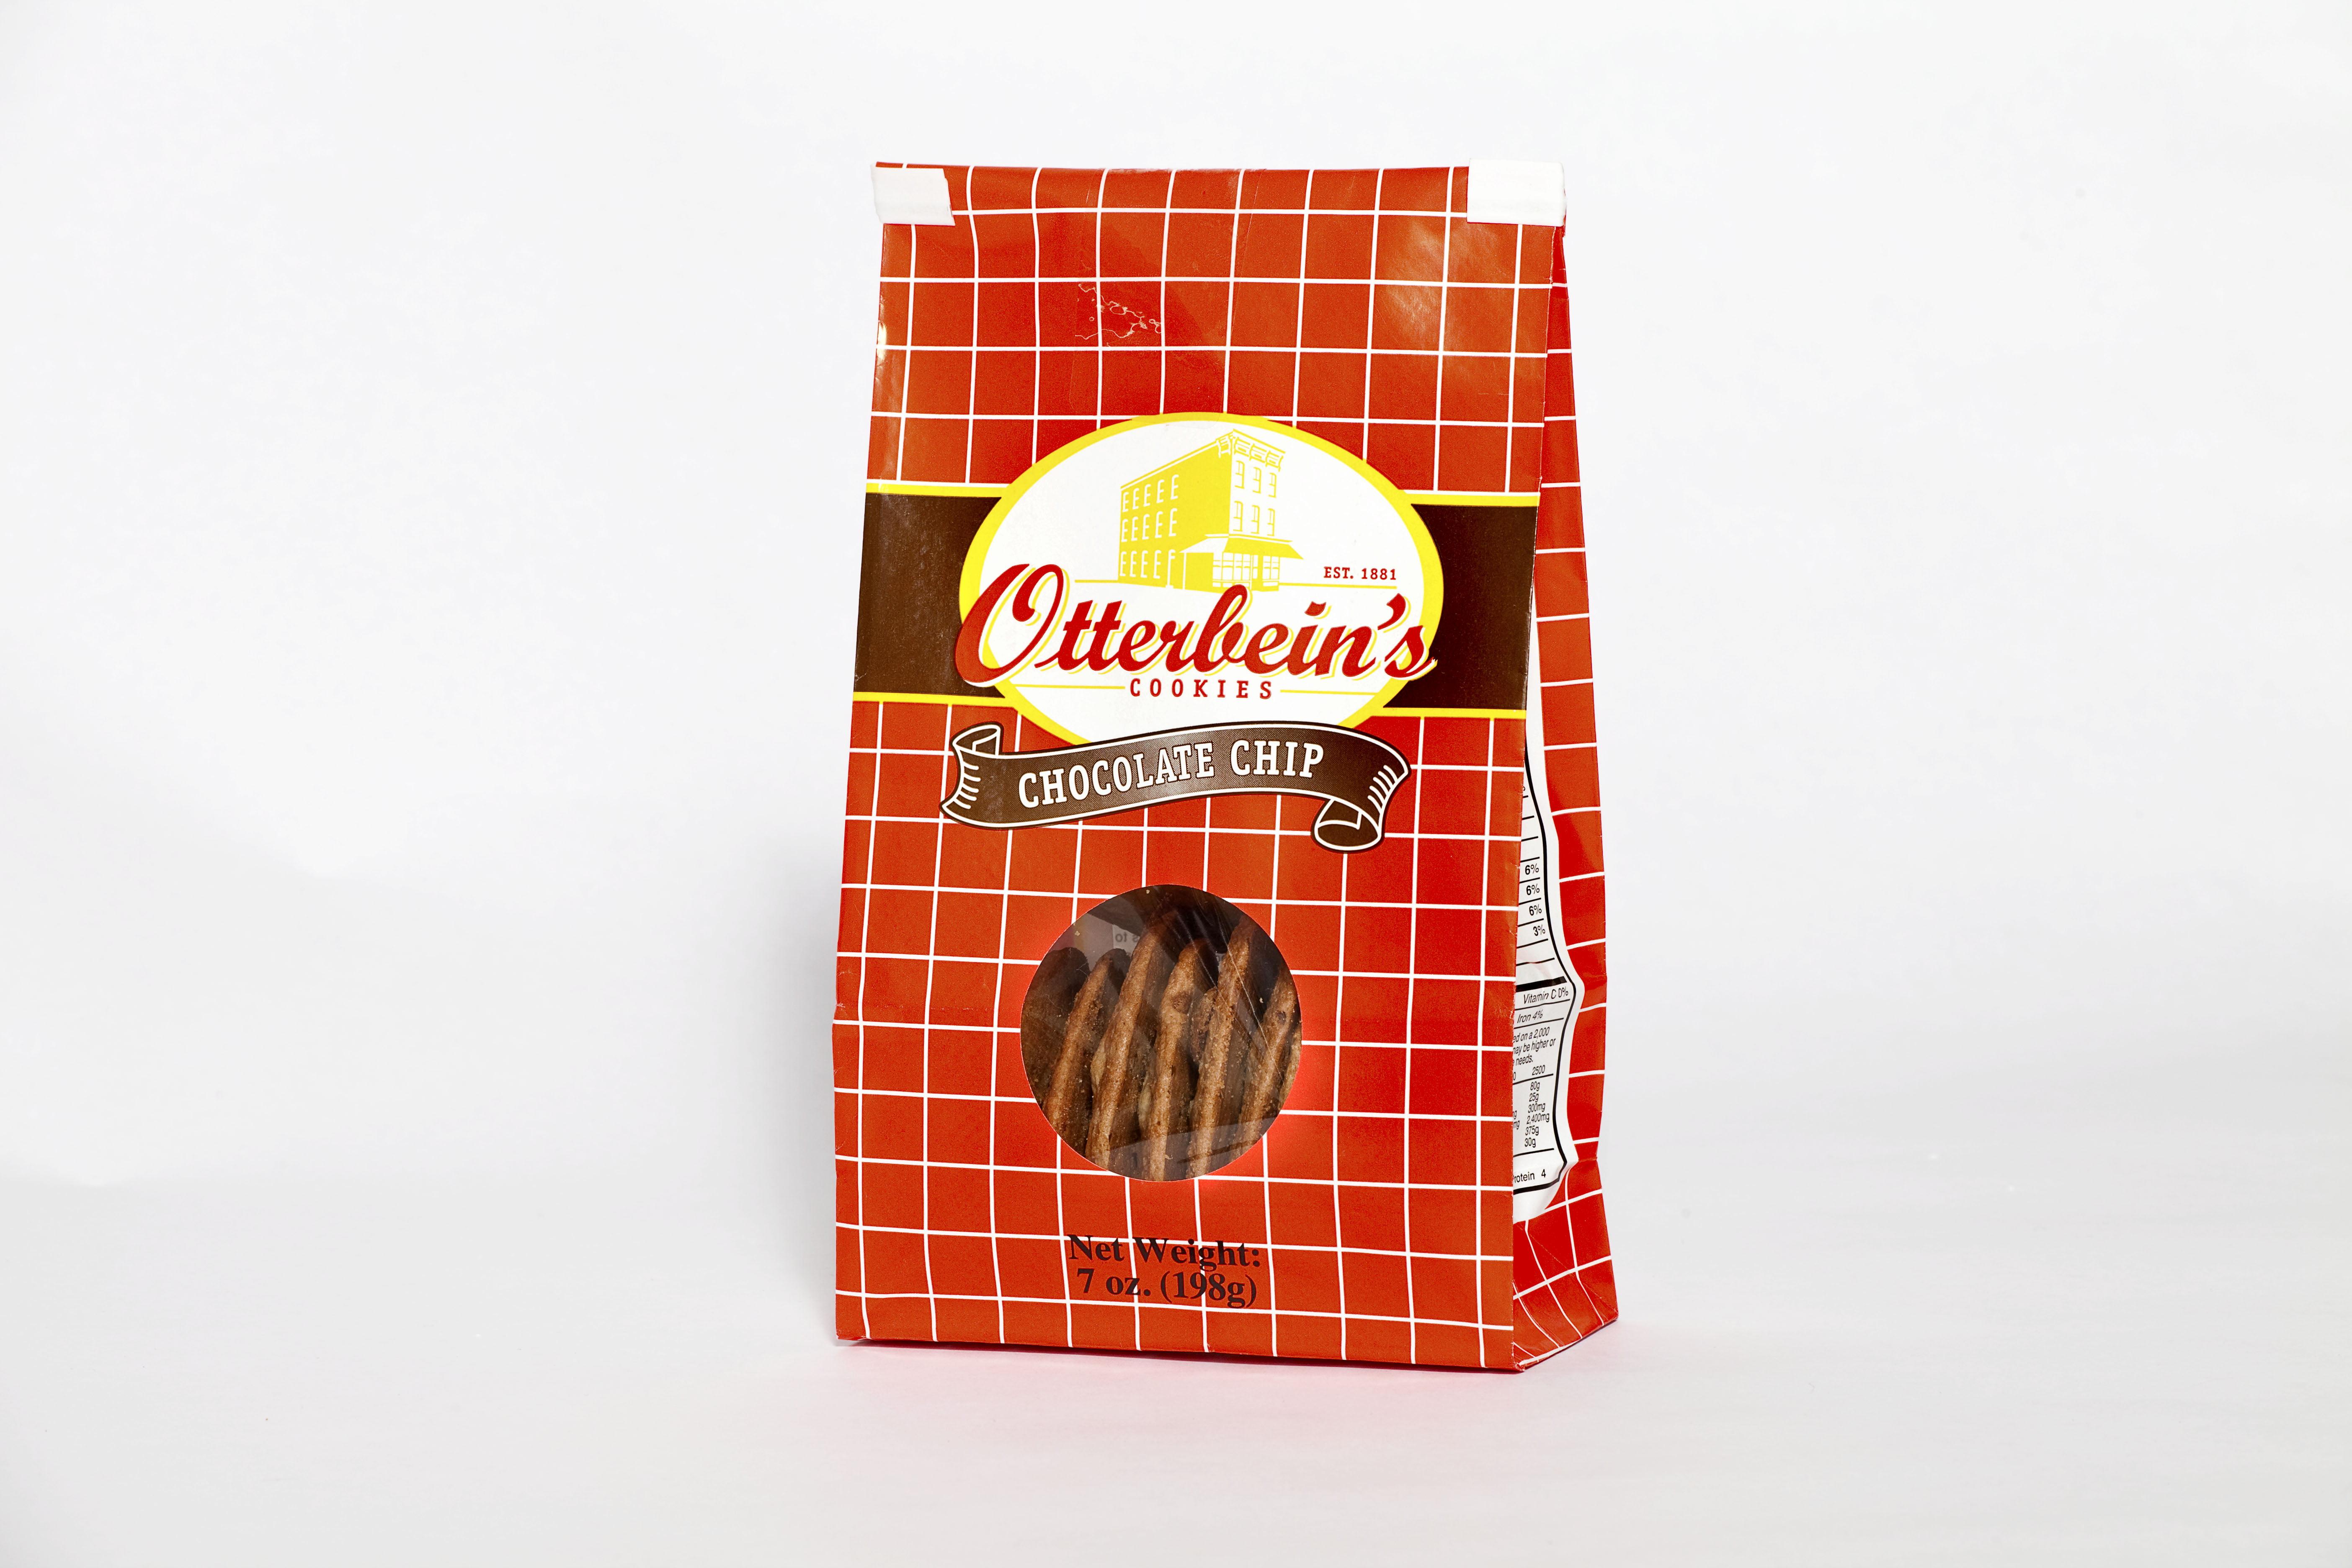 Otterbein's chocolate chip cookies, 7oz walmart. Com.